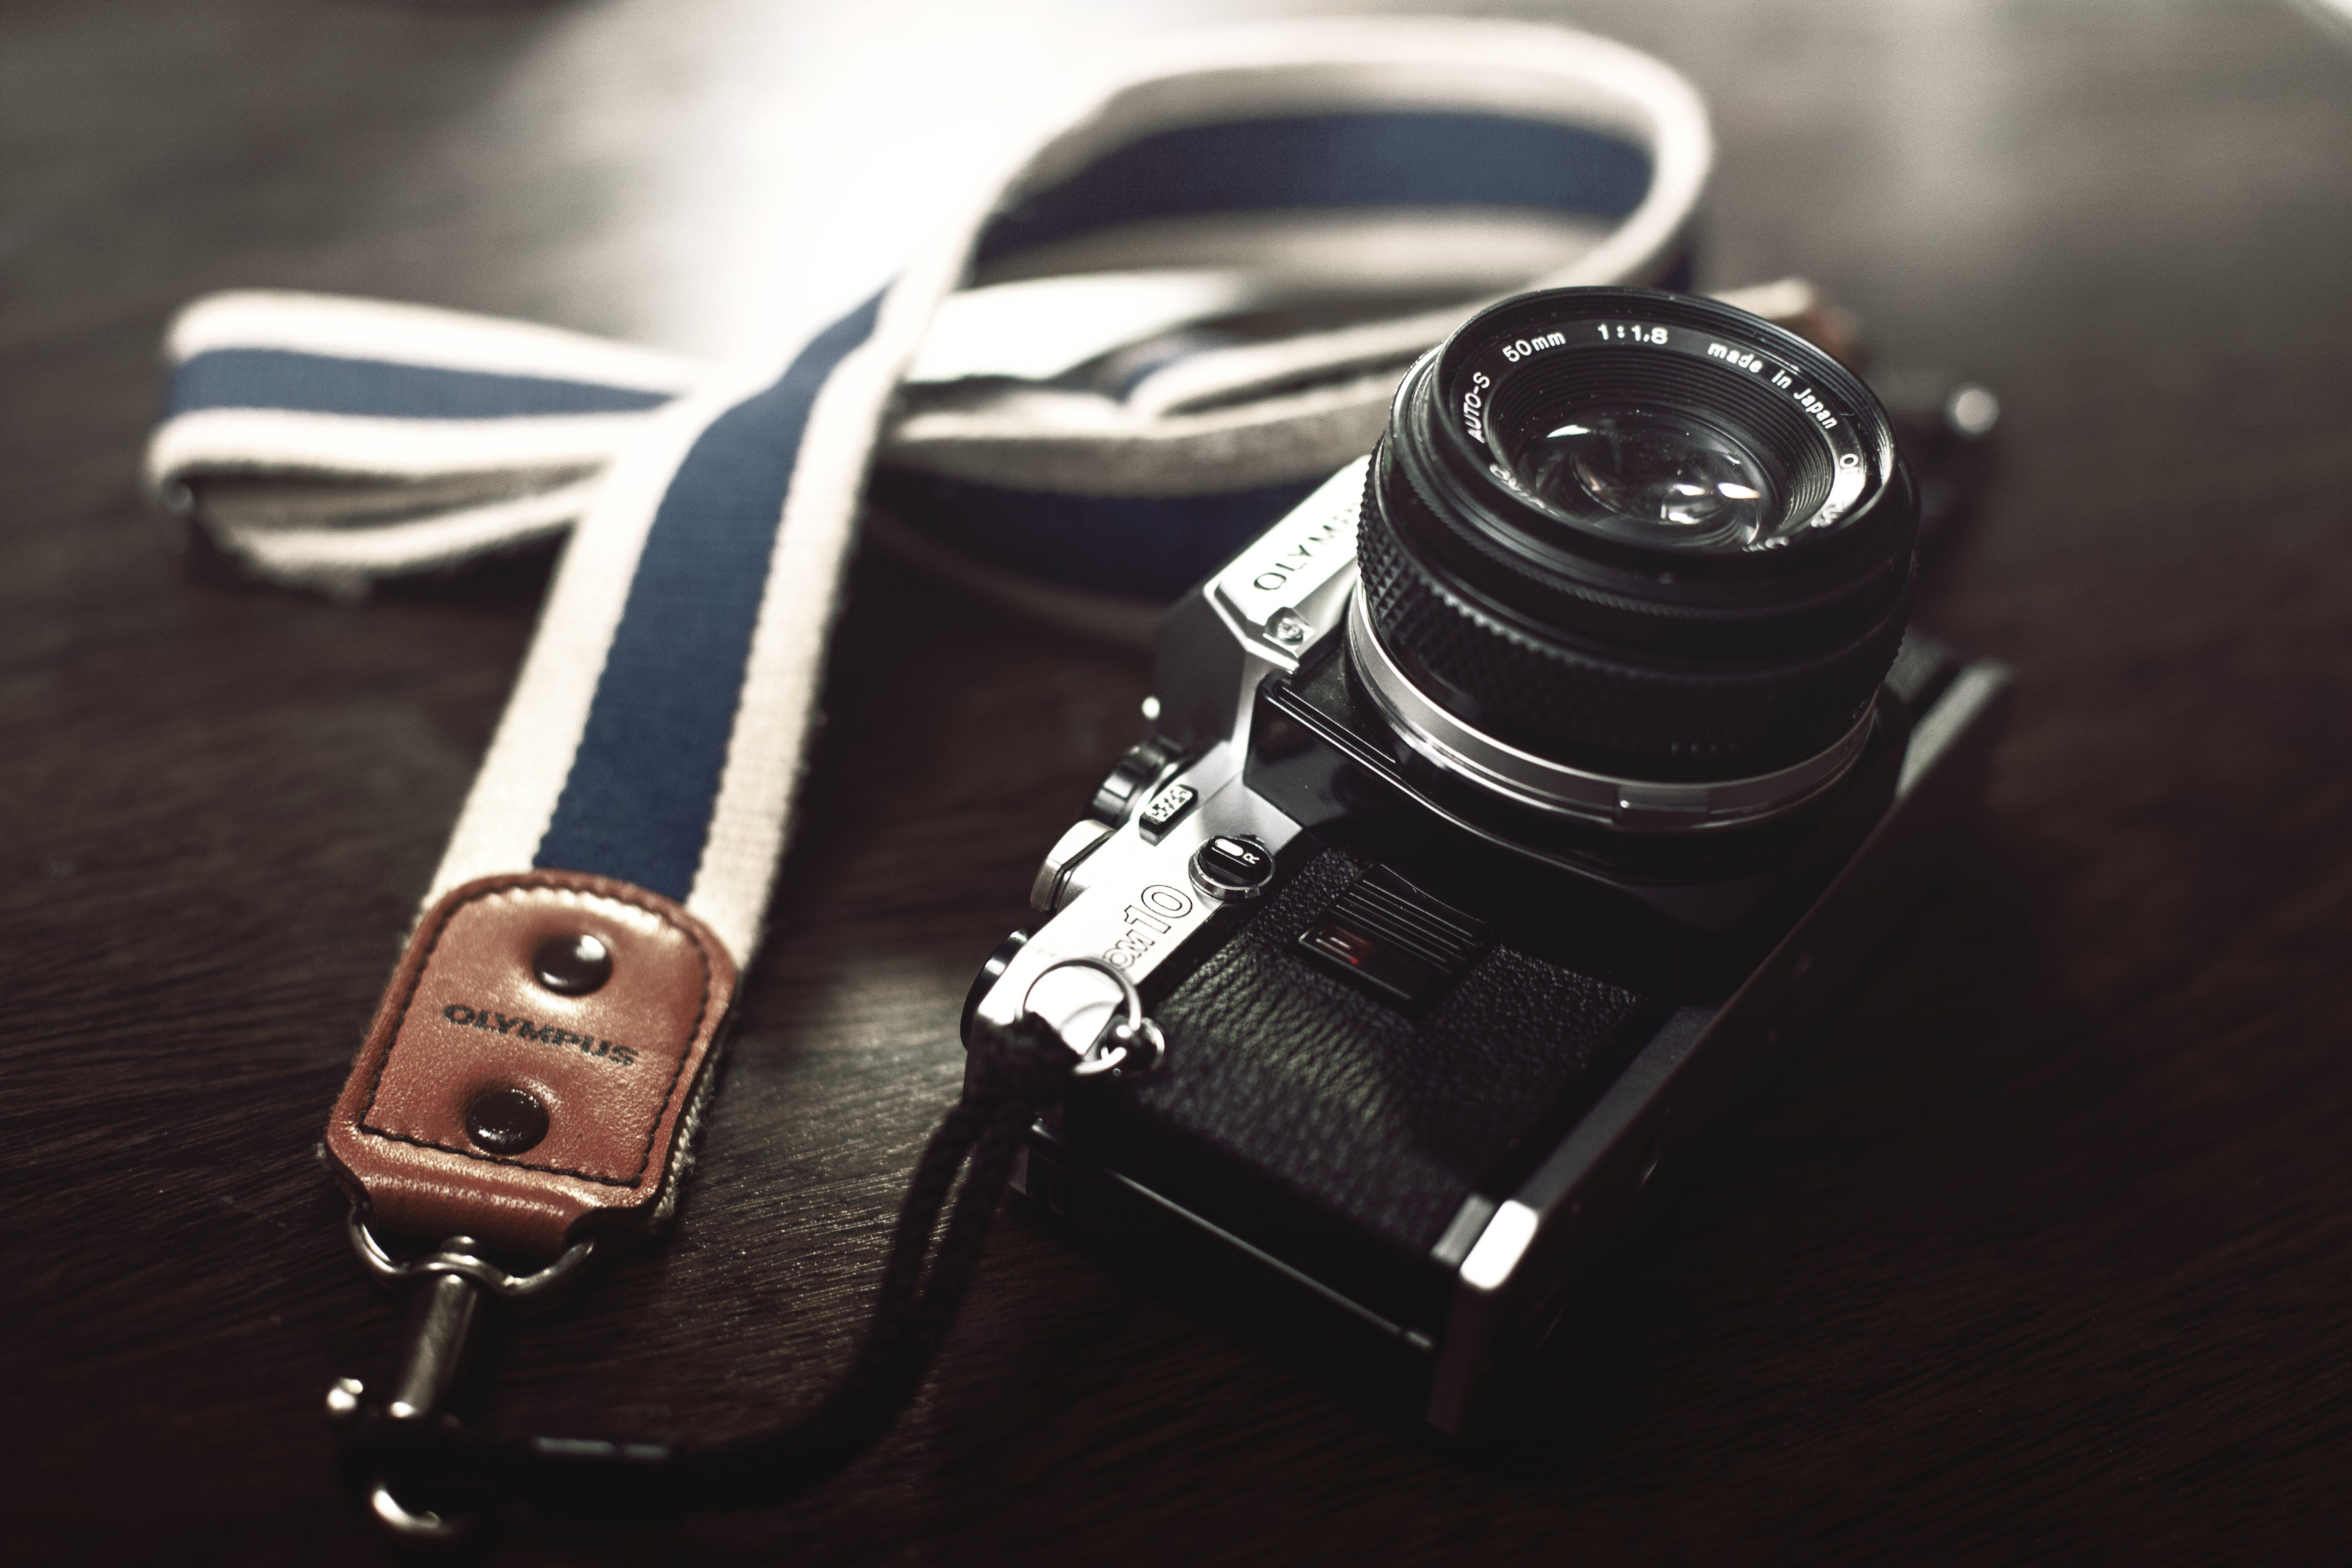 Black Dslr Camera With Leash